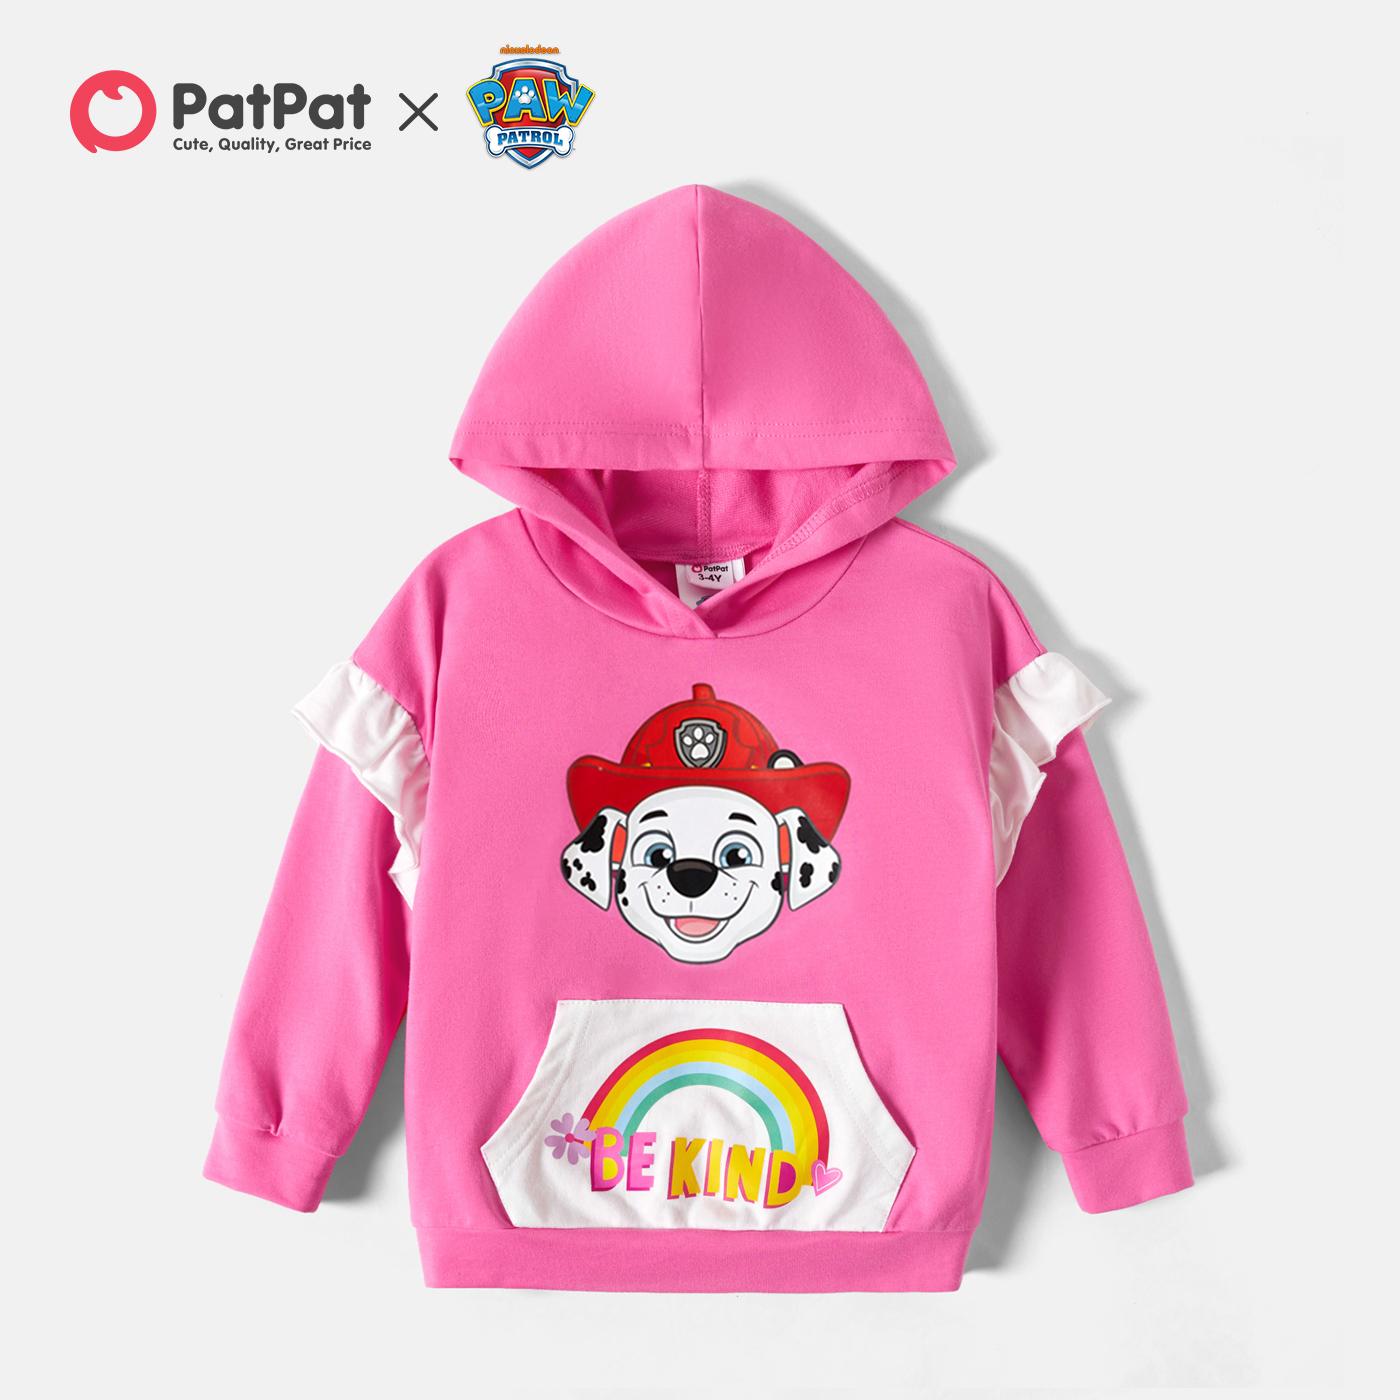 PAW Patrol Toddler Girl Rainbow Cotton Hooded Sweatshirt